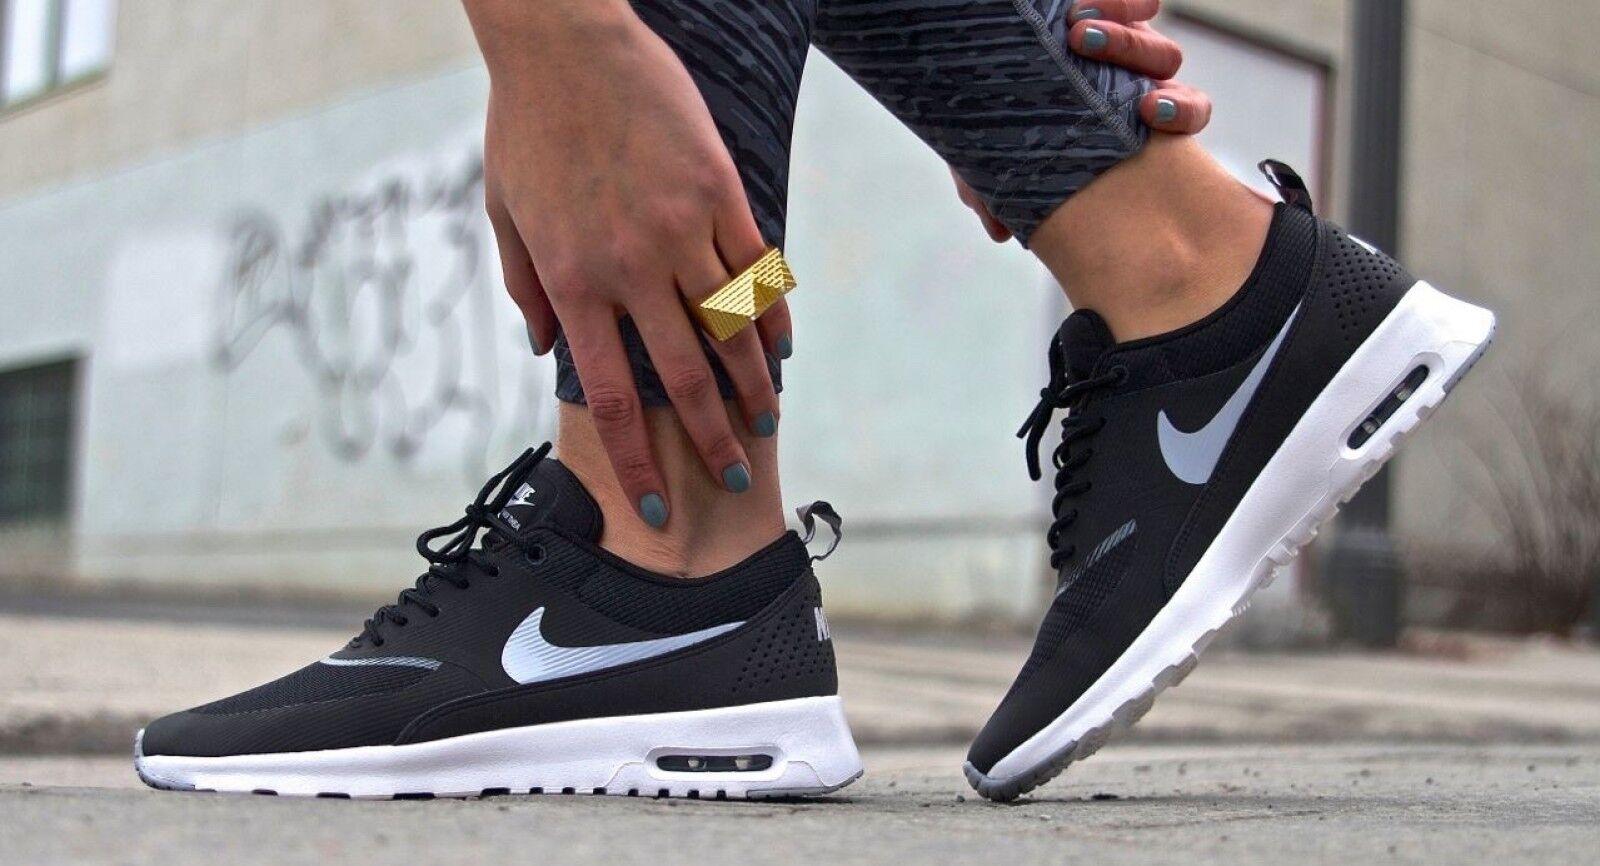 Nike Air Max Thea Womens Sz 7.5 Black/Wolf Gray/Anthrct/White 599409-007 Seasonal clearance sale